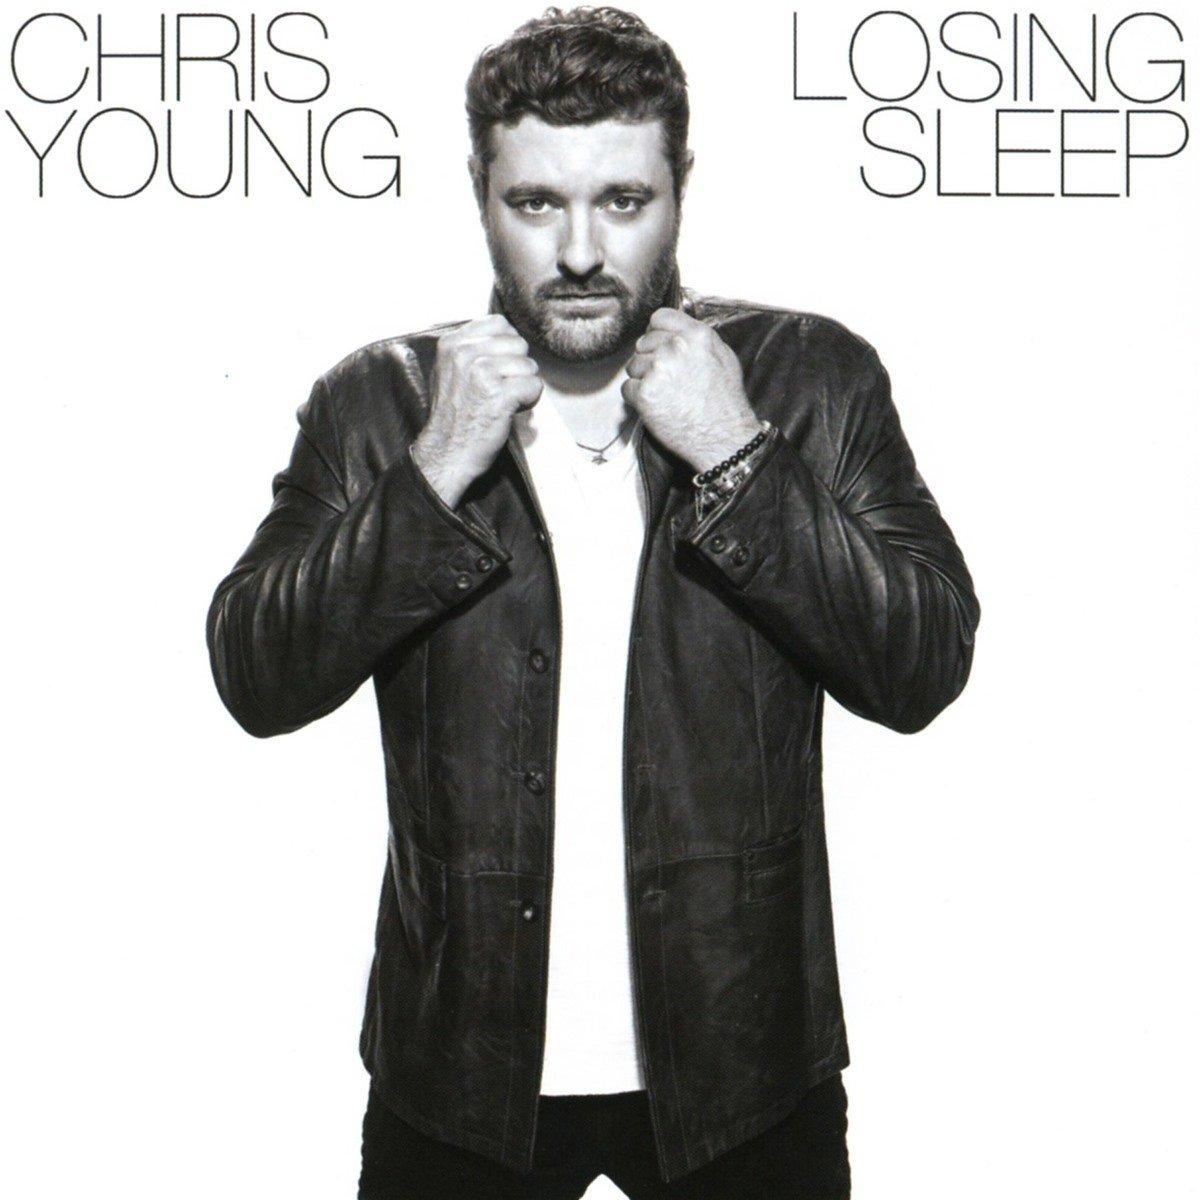 Chris Young - Losing Sleep.jpg